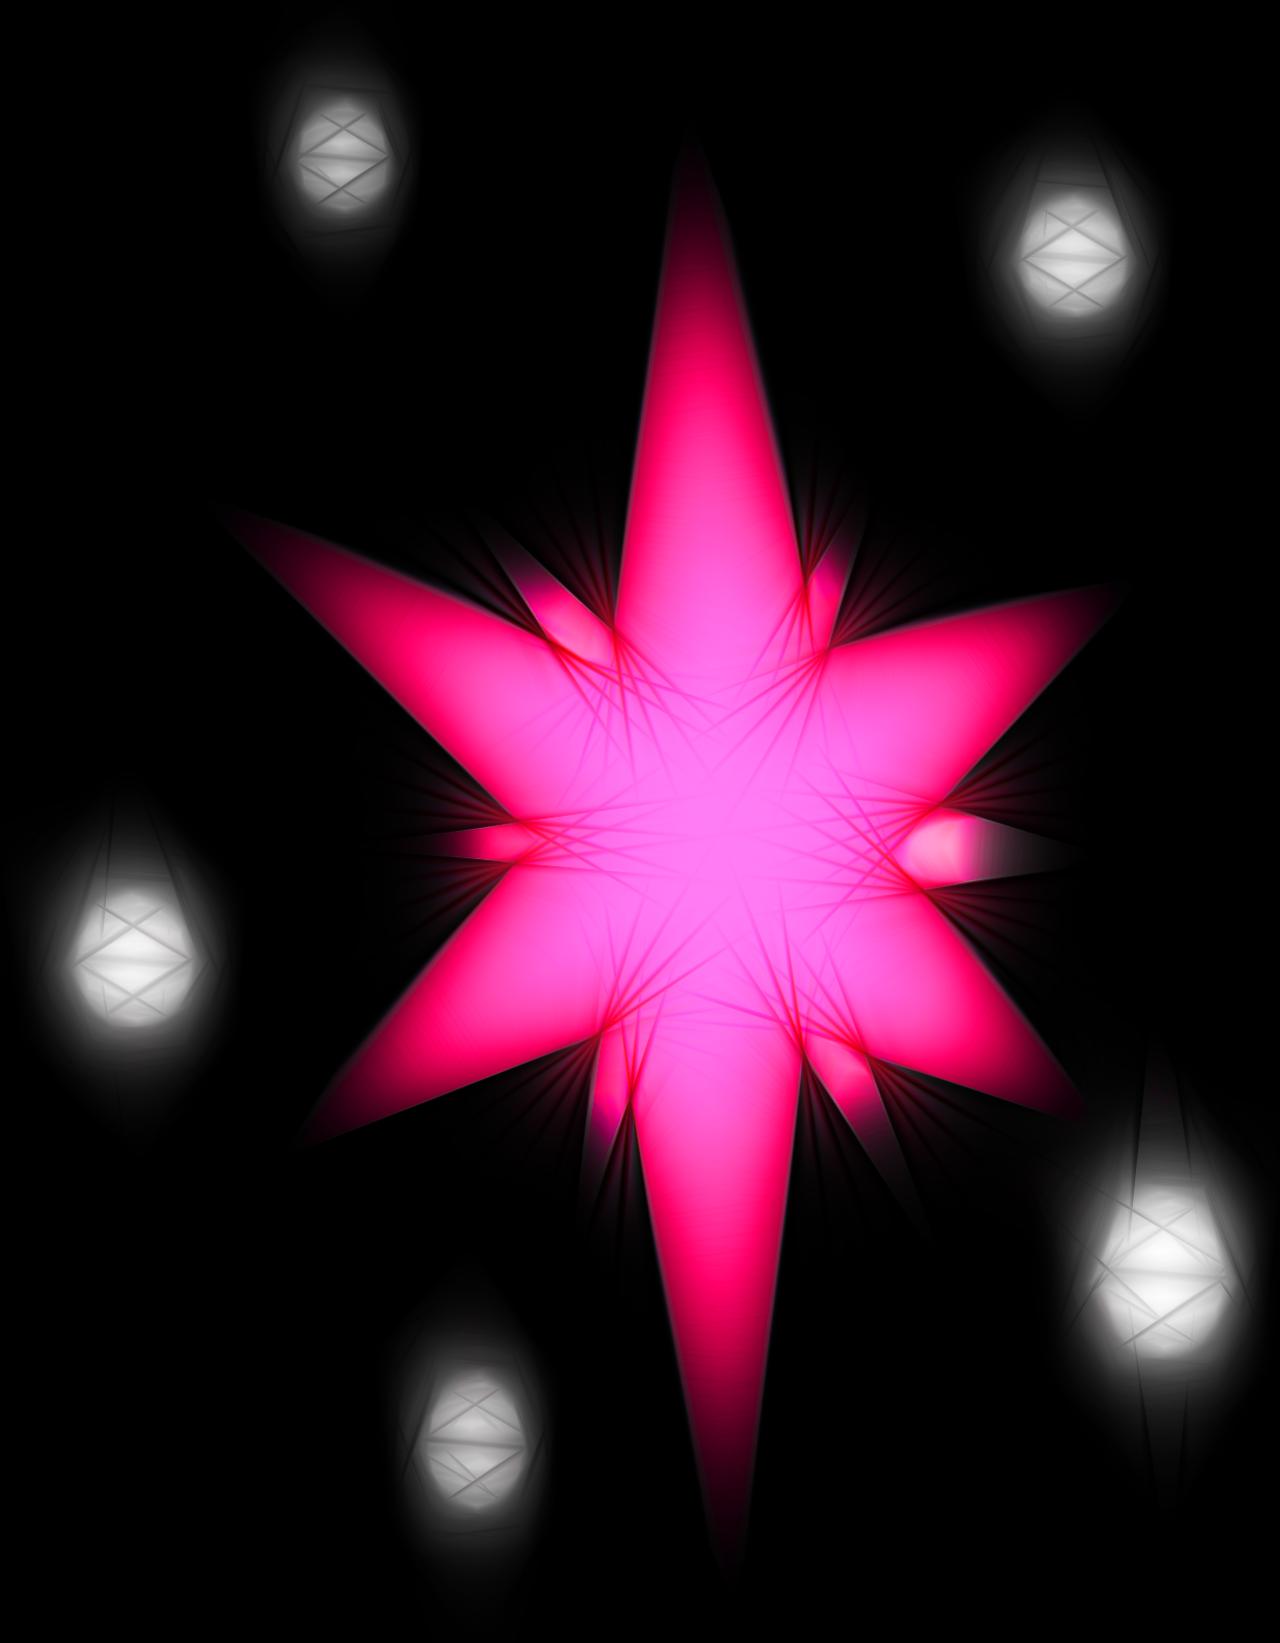 Neon Mlp Cutie Marks Zip My Little Pony Unicorn Mlp Twilight Sparkle My Little Pony Wallpaper